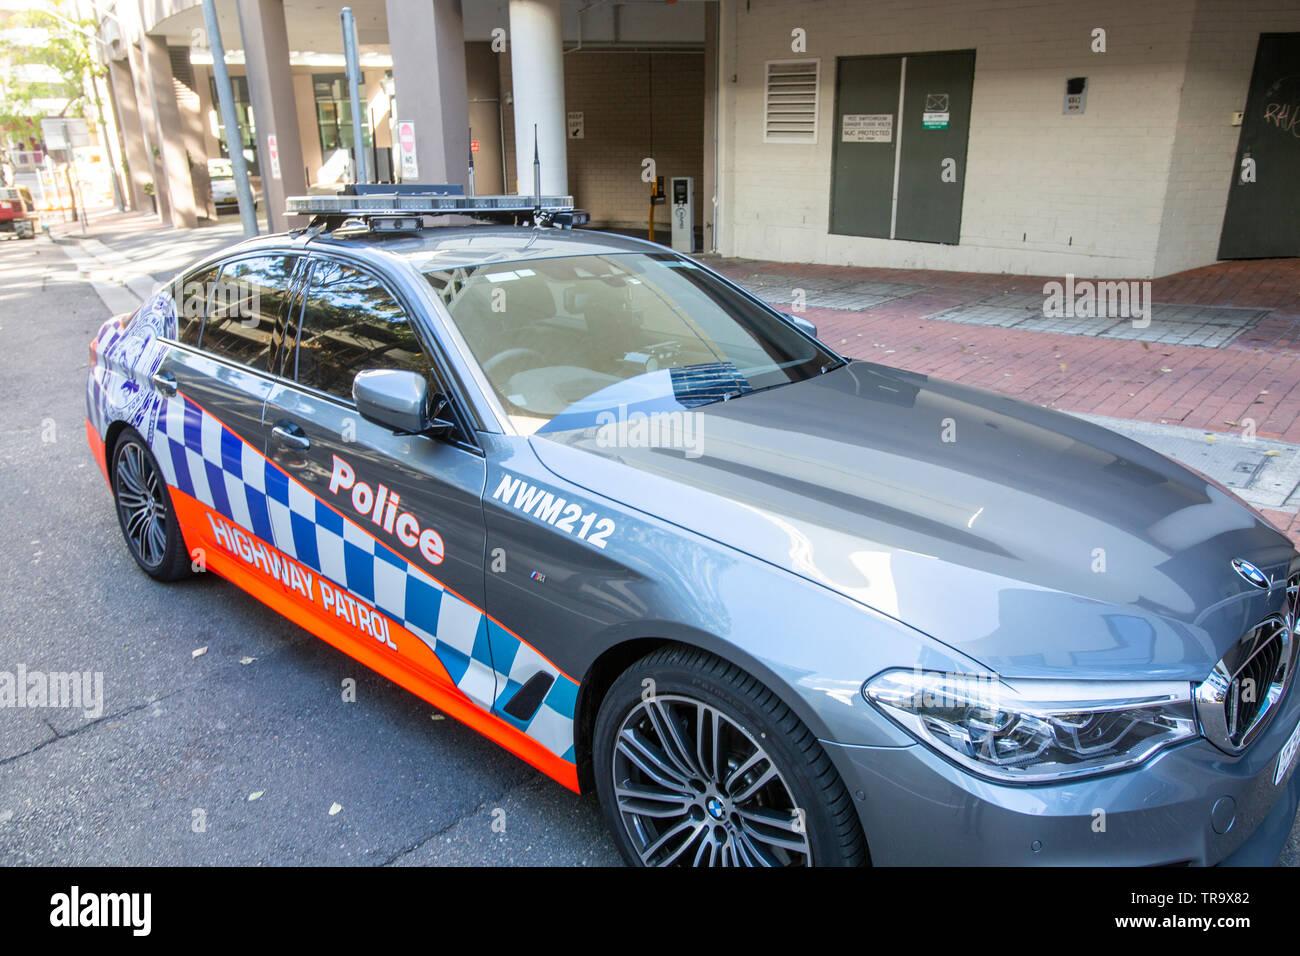 Sydney police BMW highway patrol car parked in Parramatta,Western Sydney,Australia - Stock Image